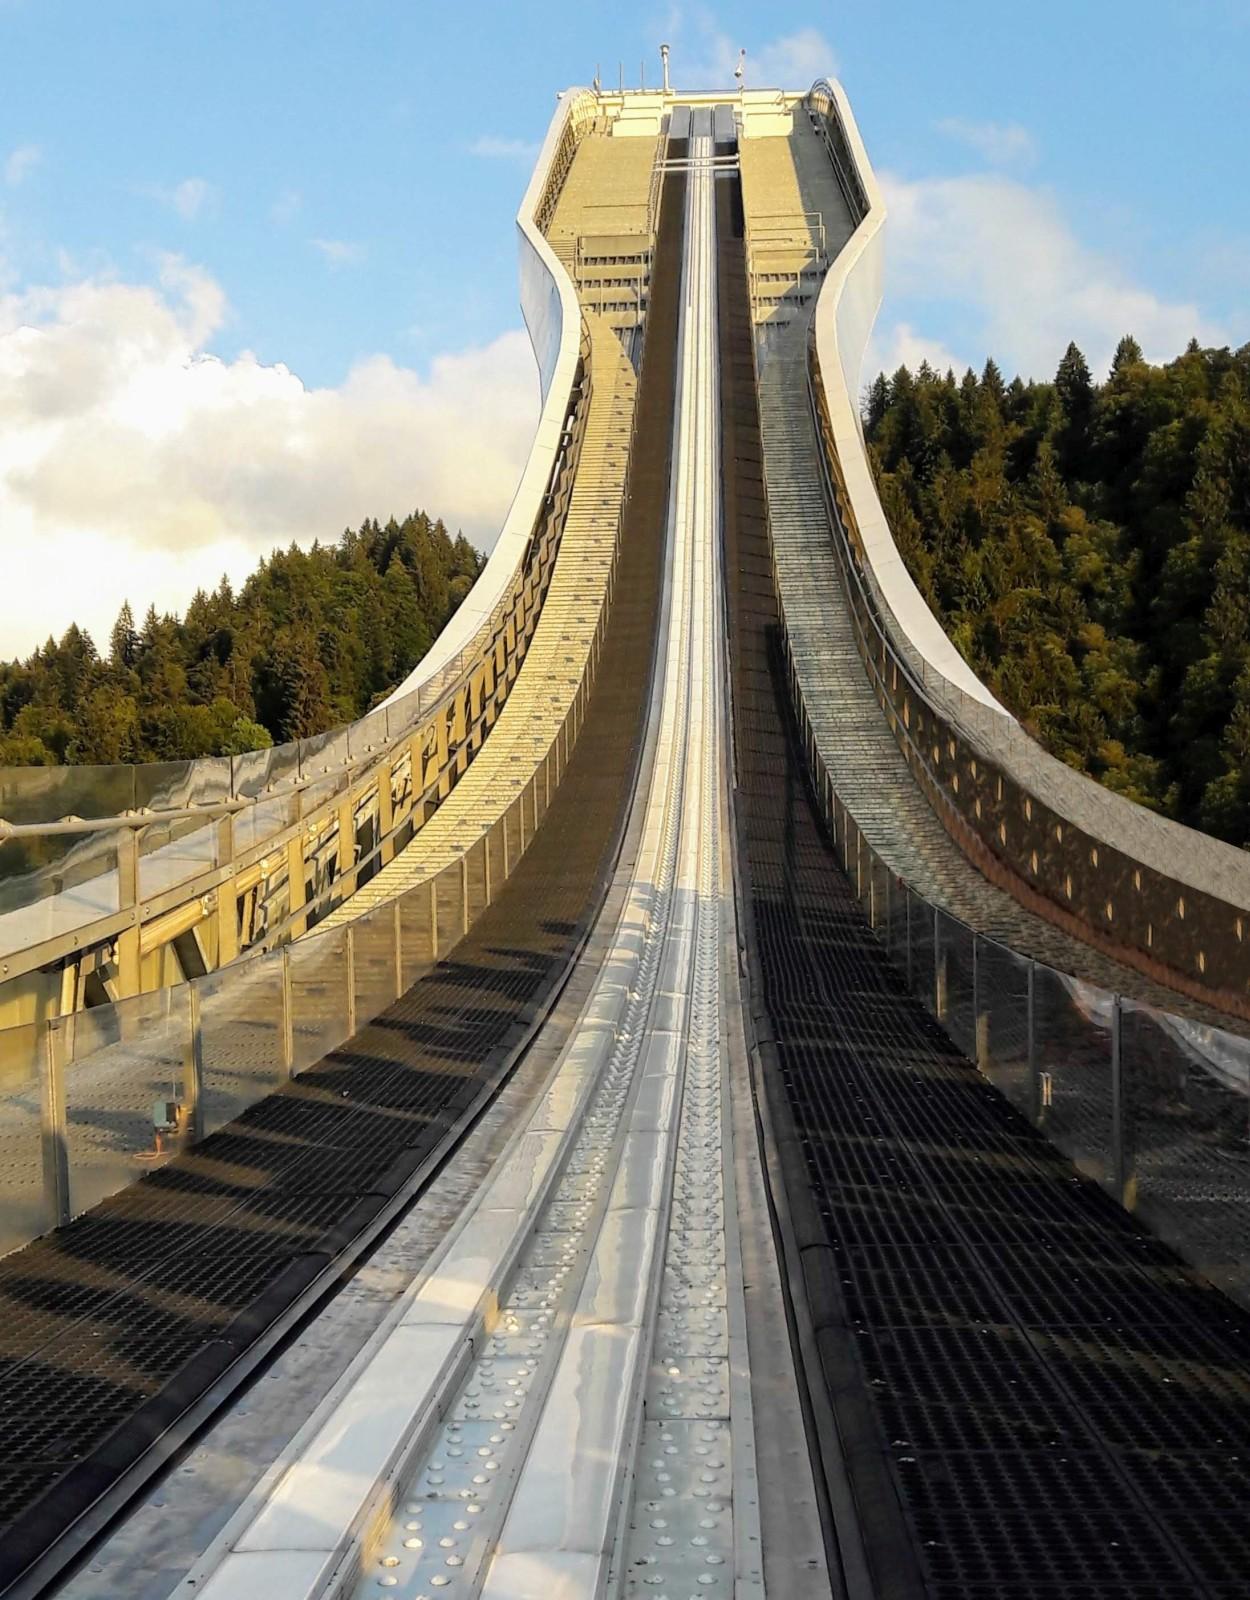 Anlaufturm der Olympia Sprungschanze in Garmisch-Partenkirchen